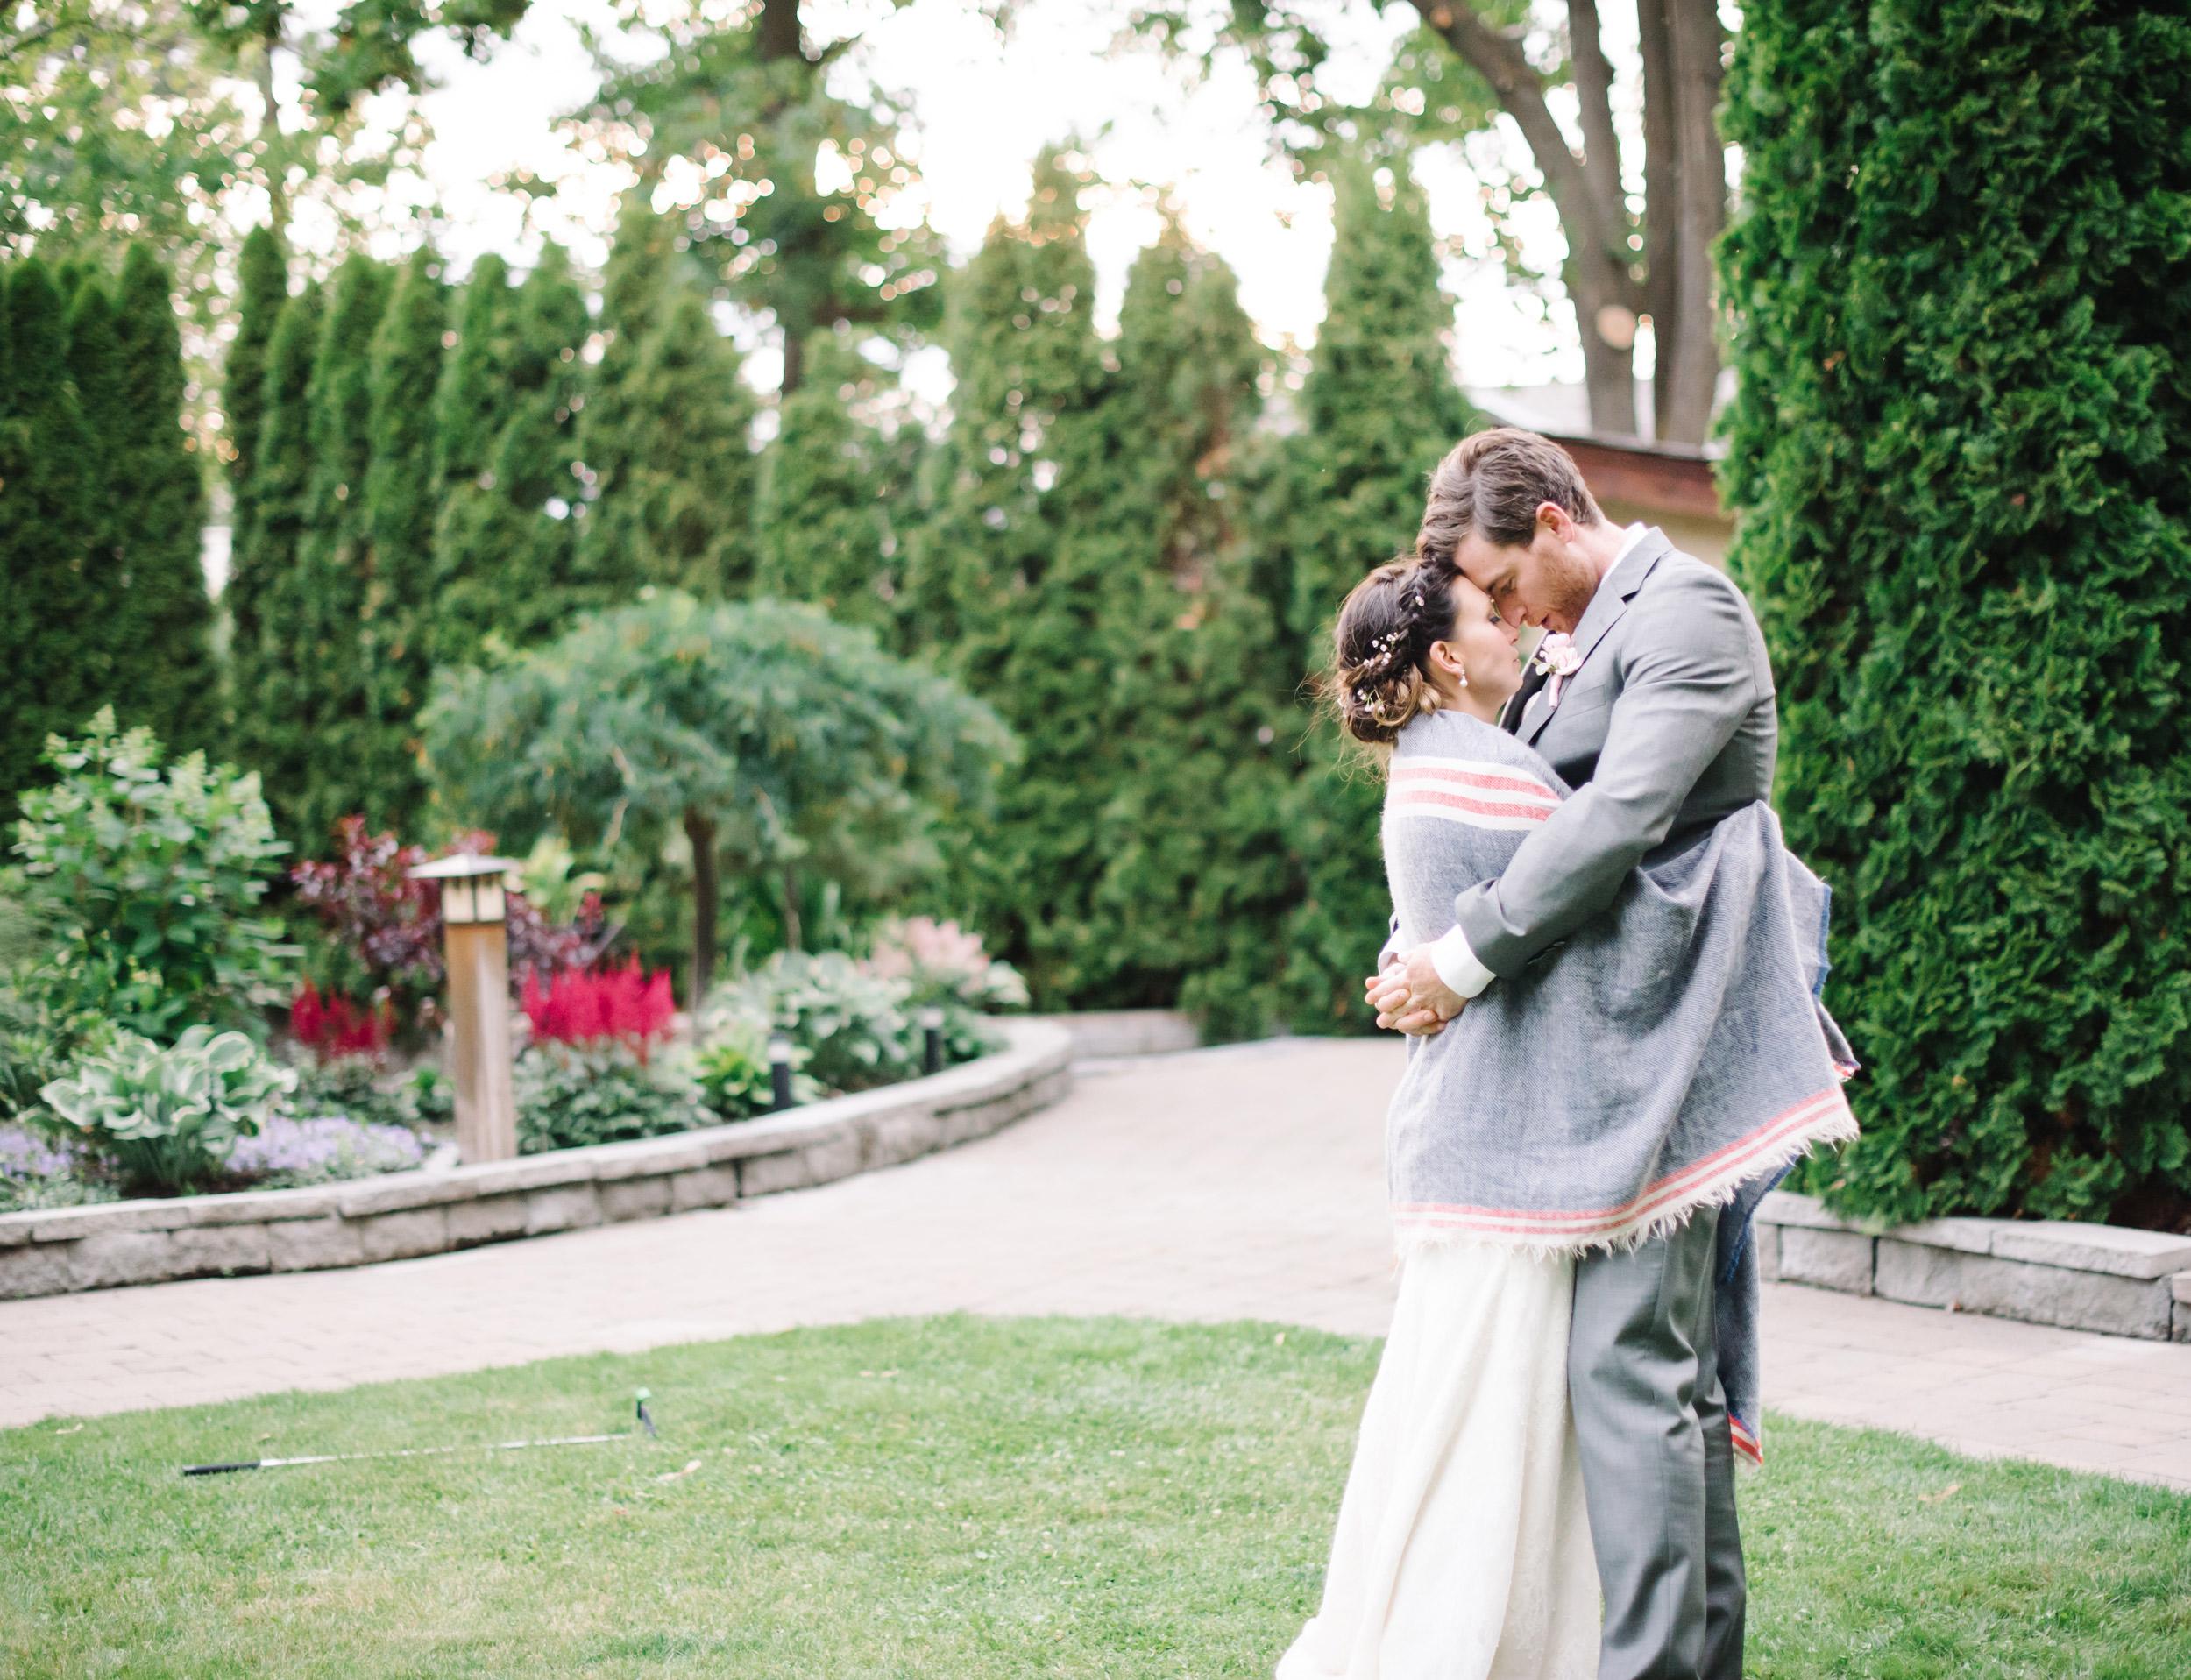 043-Okanagan_Wedding_Photographers.jpg